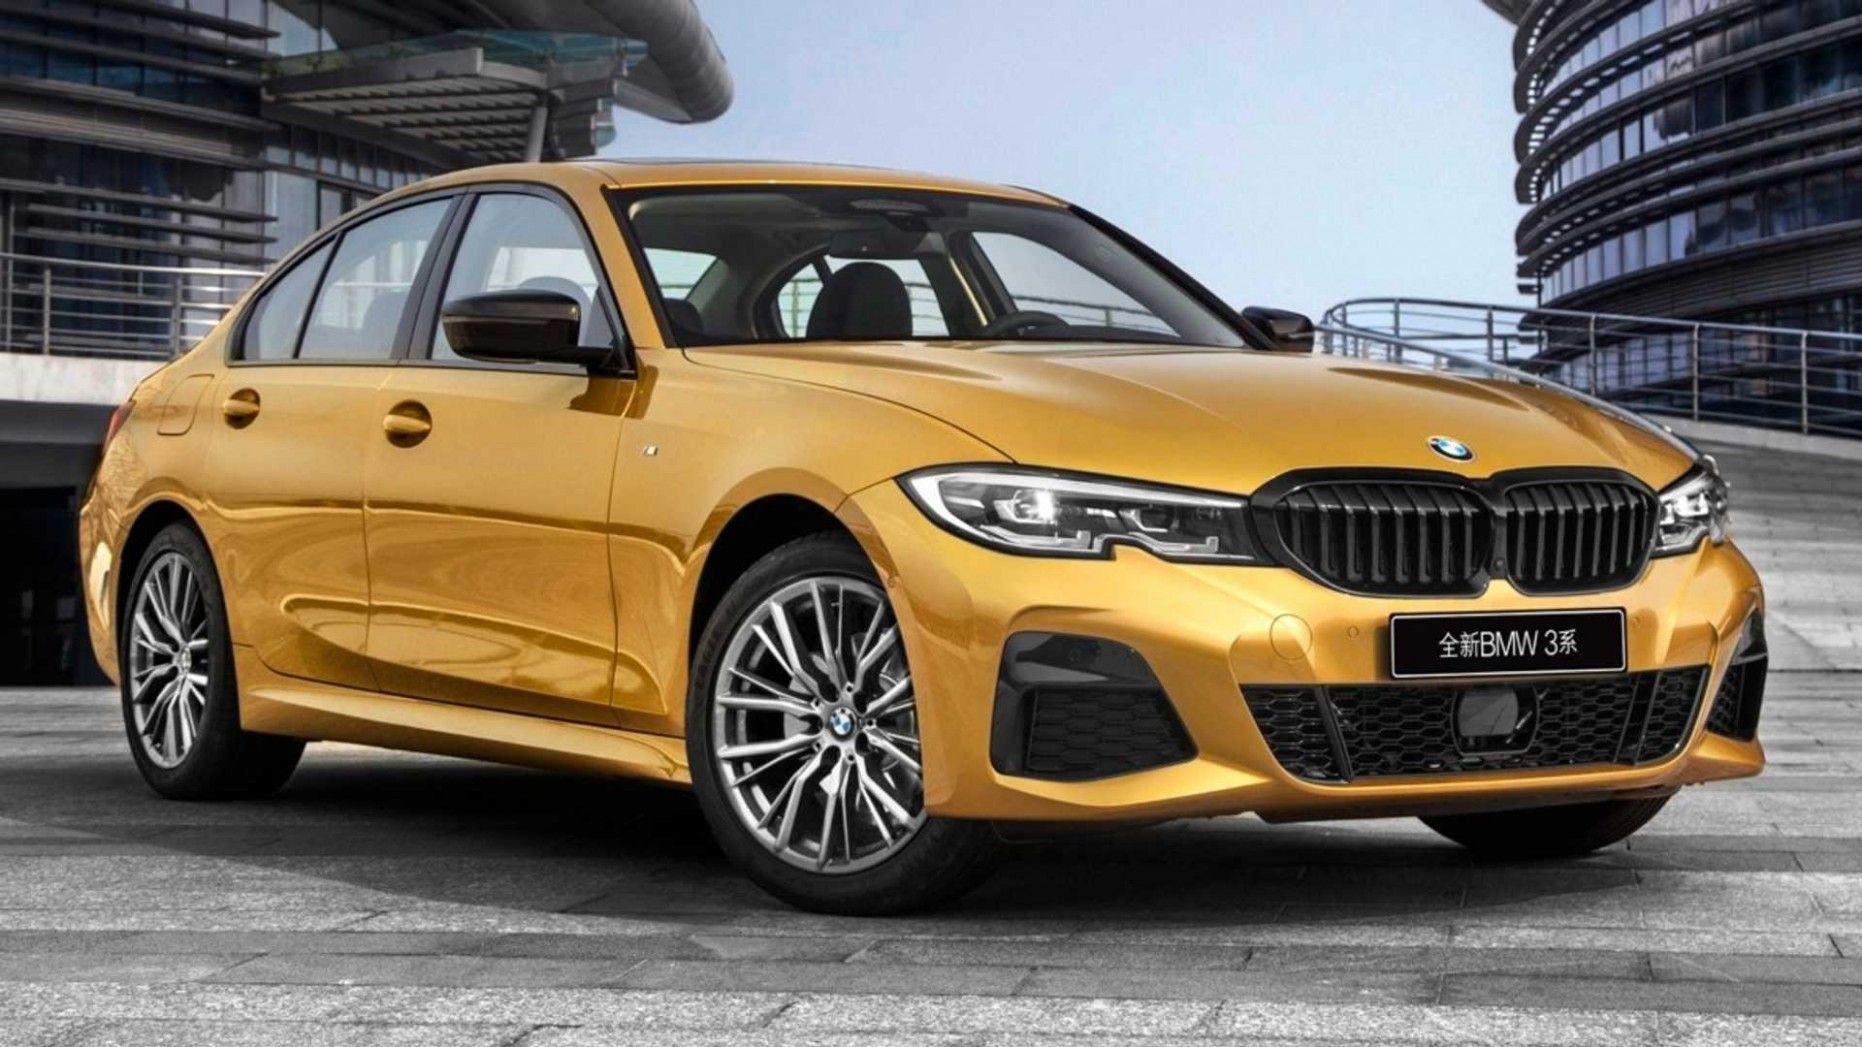 3 BMW 3 Series Brings Overview  Bmw, Bmw 3 series, Bmw car